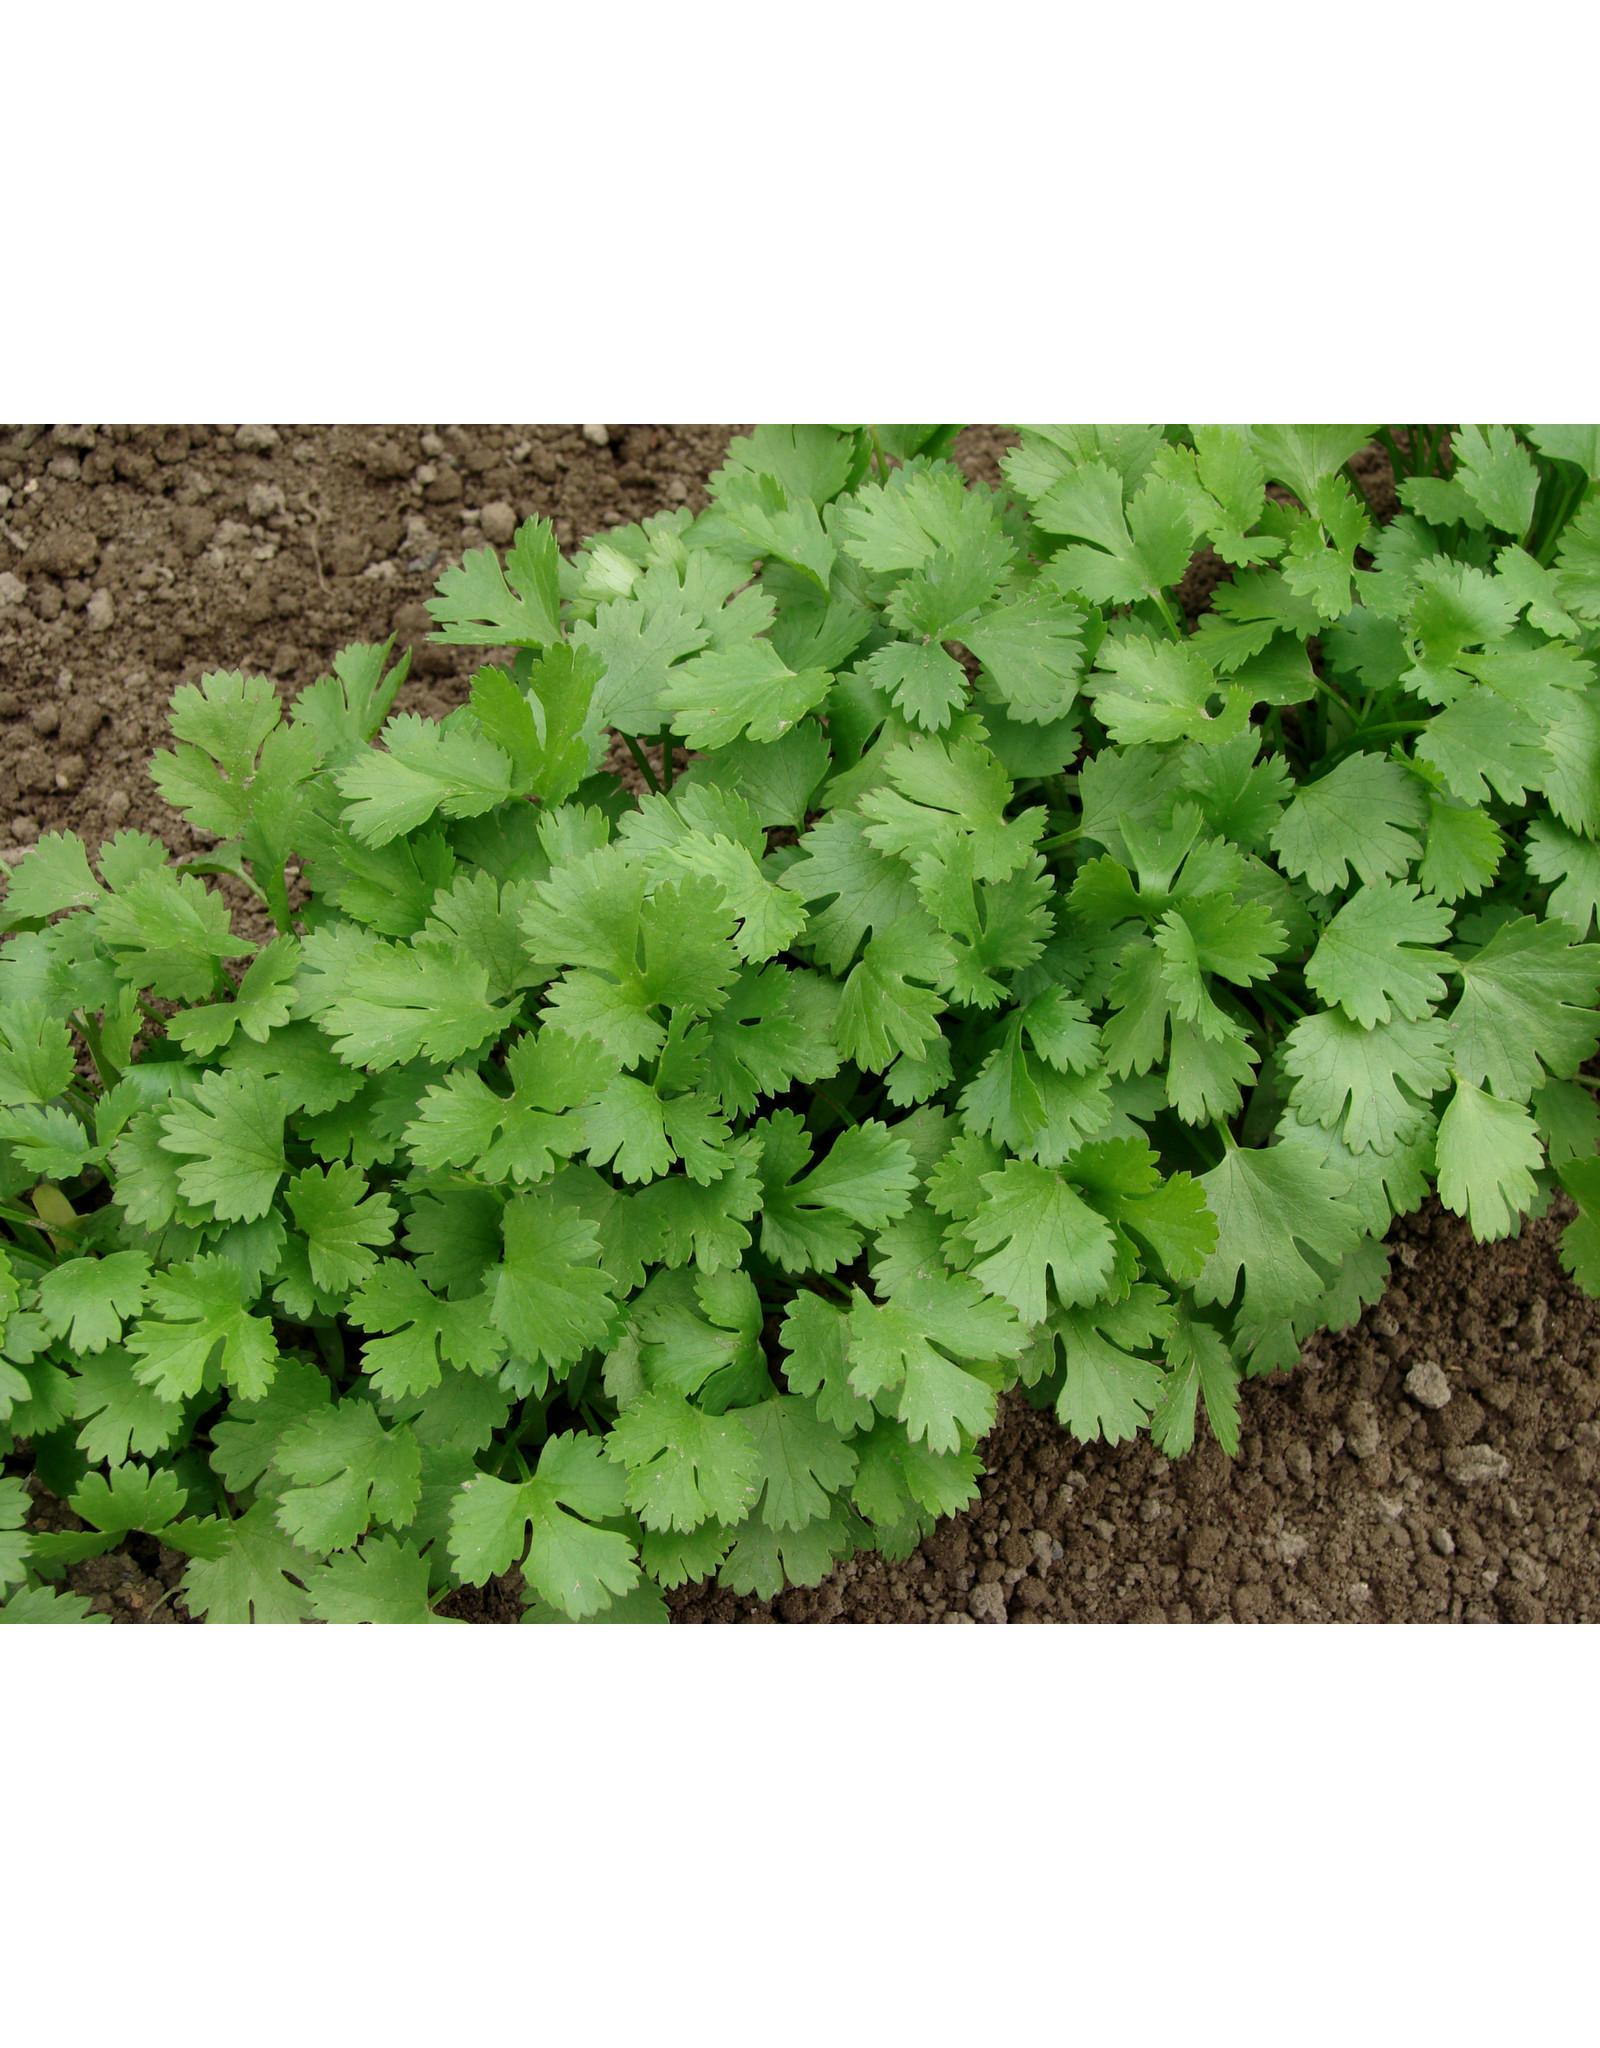 Seeds - Cilantro / Coriander Org, Large